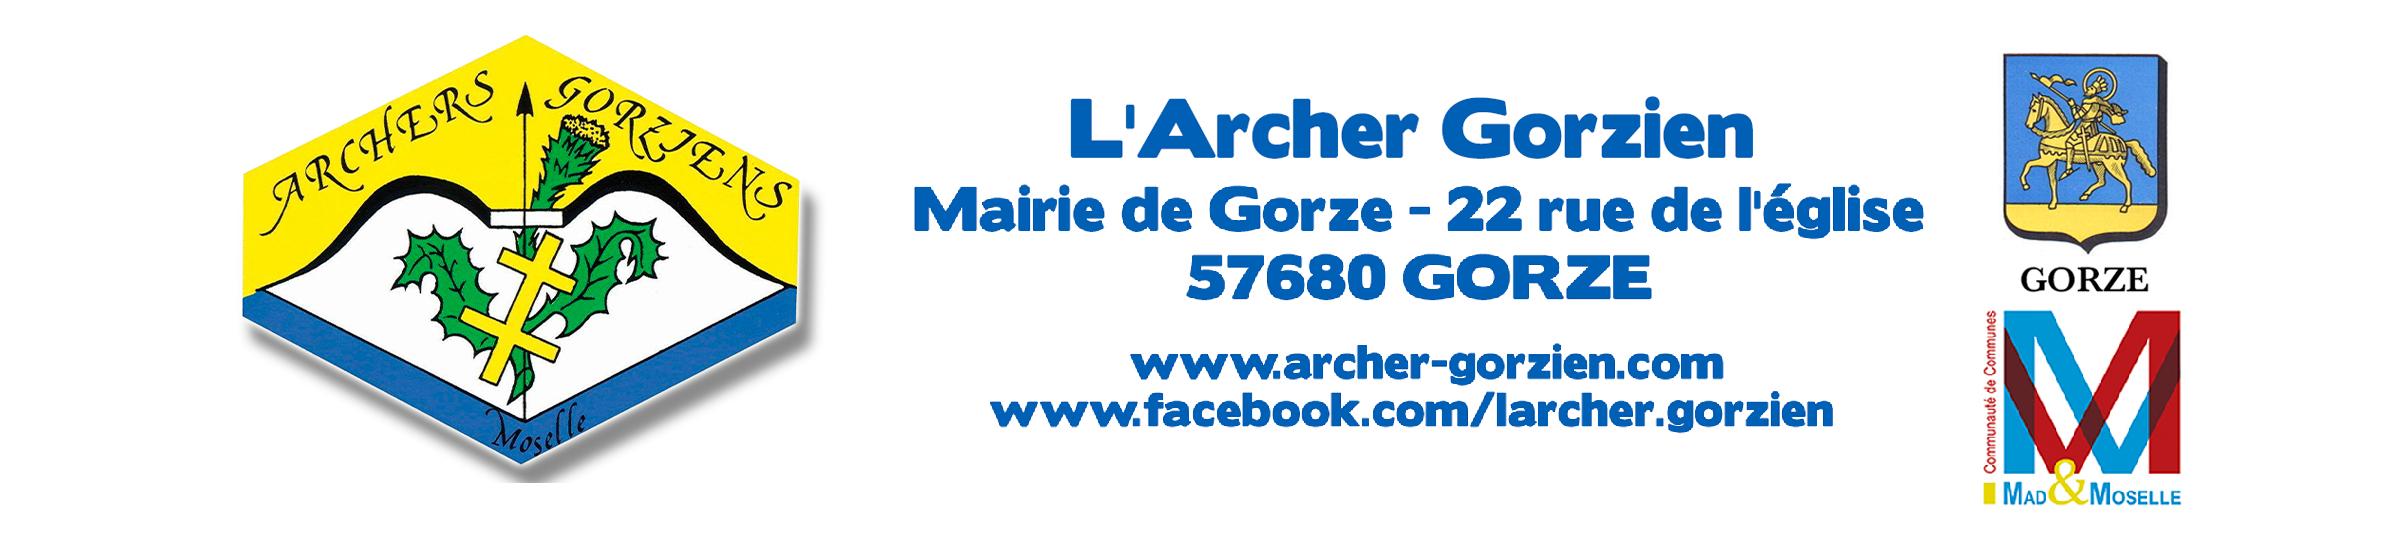 L'ARCHER GORZIEN